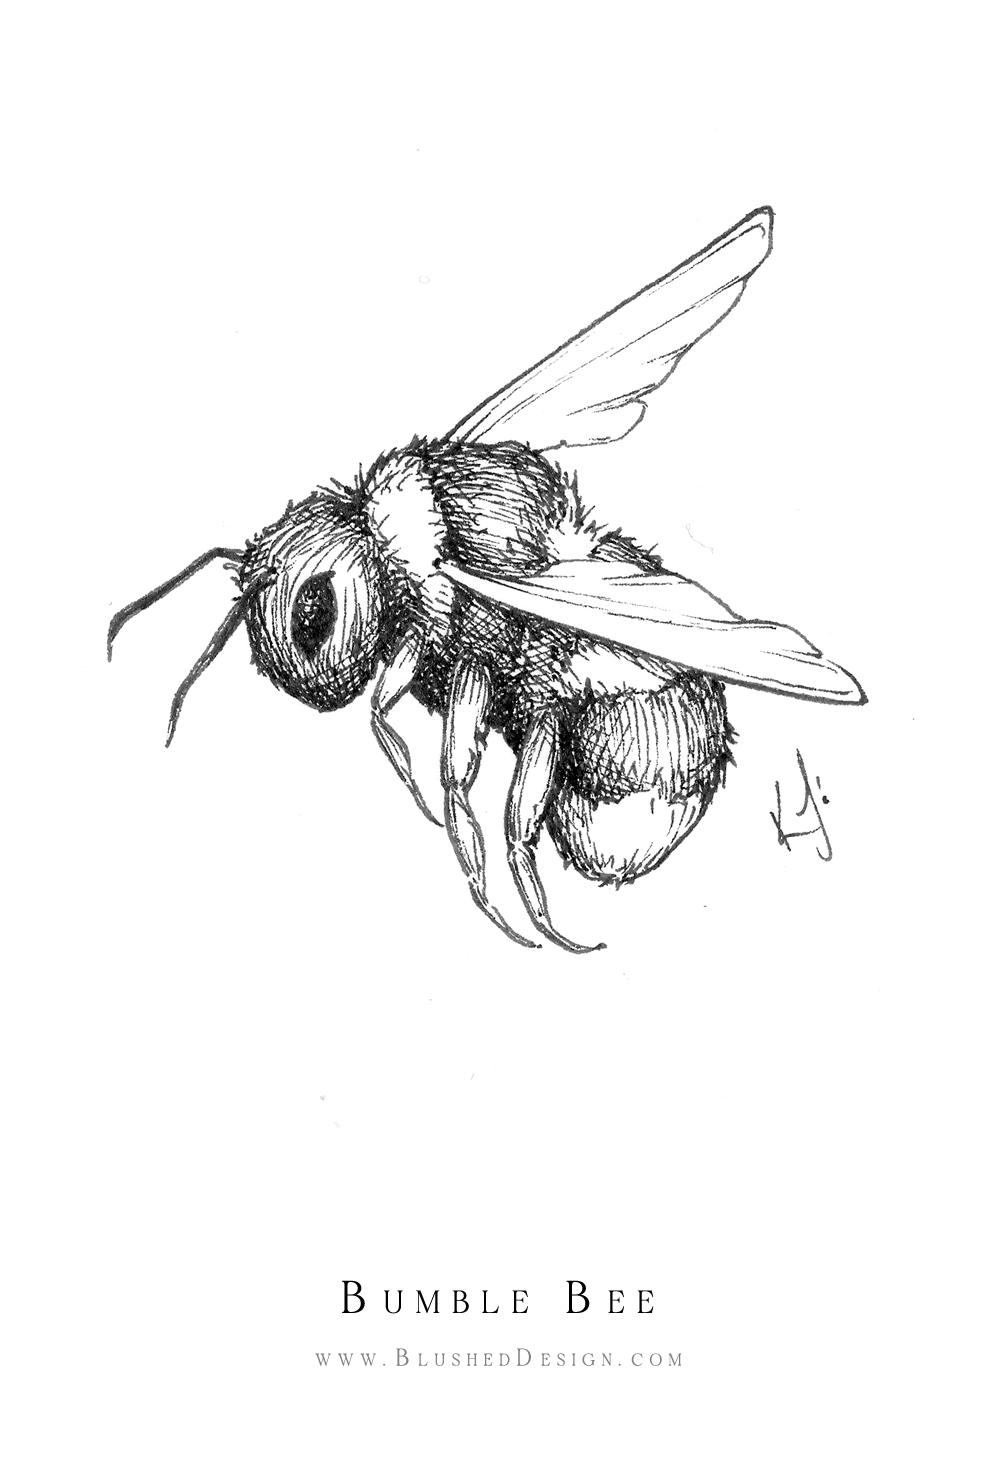 Bumble Bee Drawings | Fine Art America